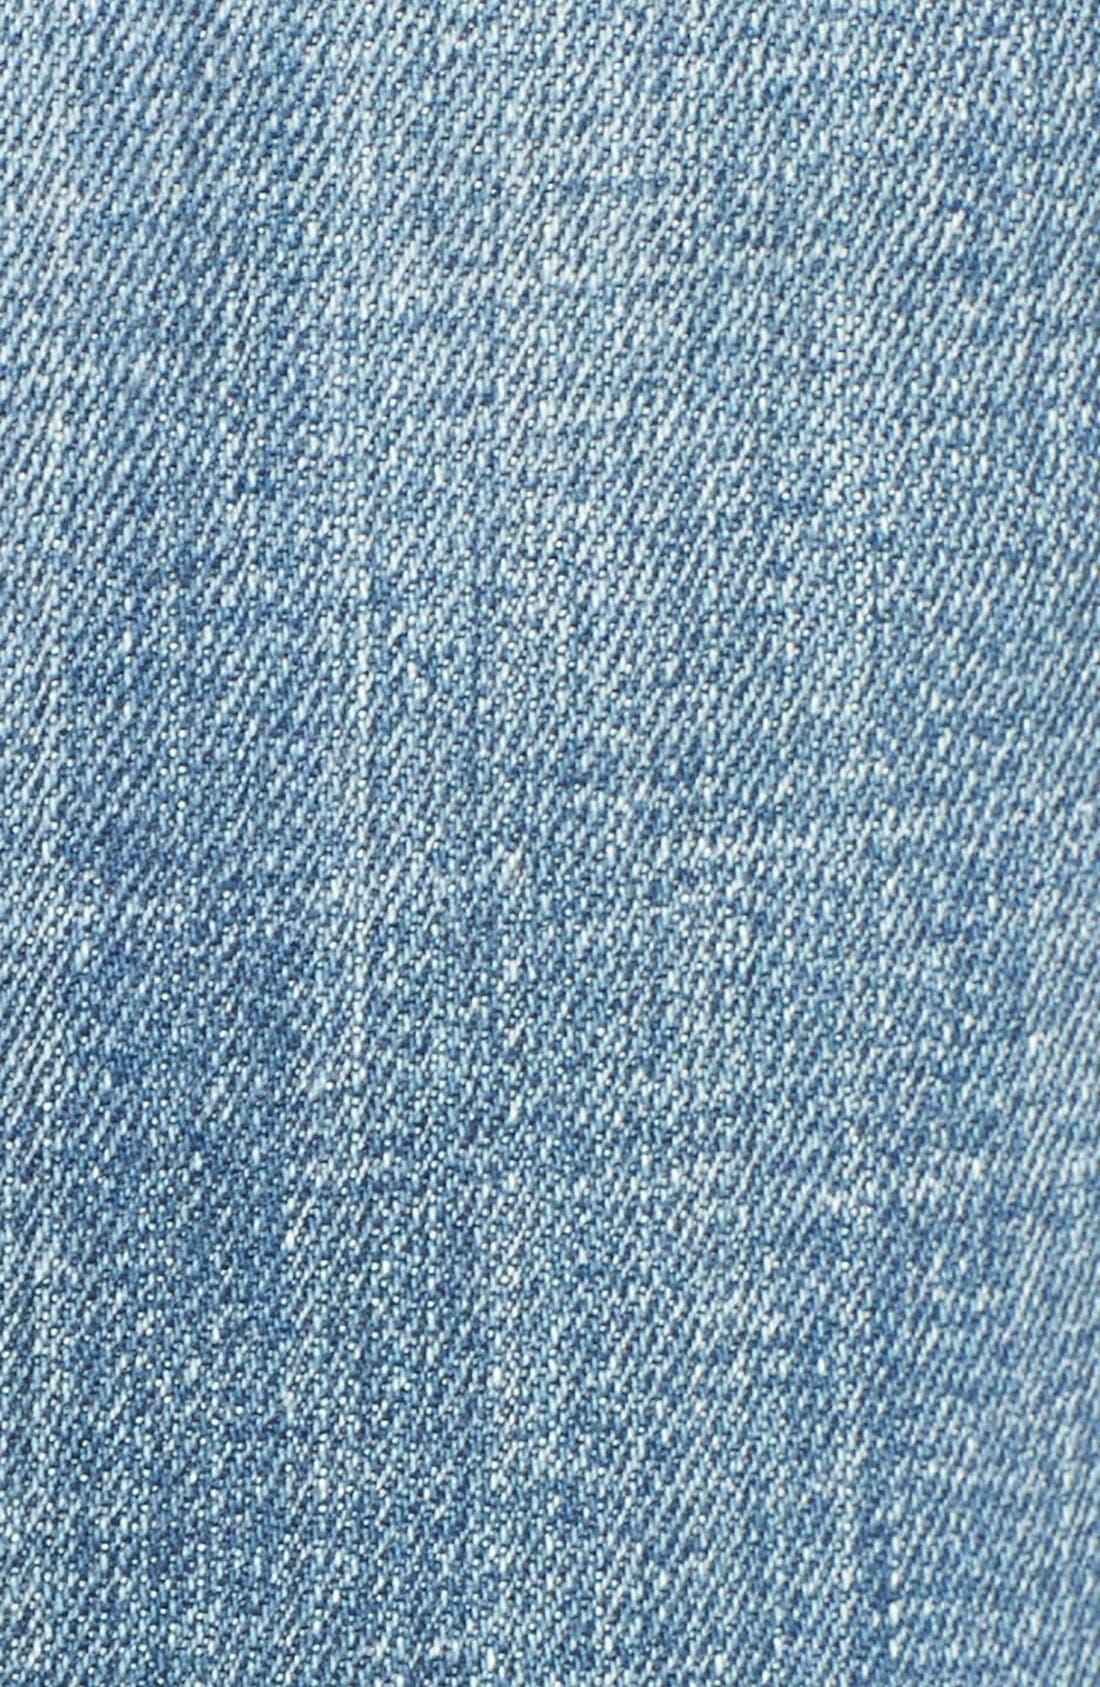 Alternate Image 5  - Vigoss 'Chelsea' Flare Jeans (Medium Wash)